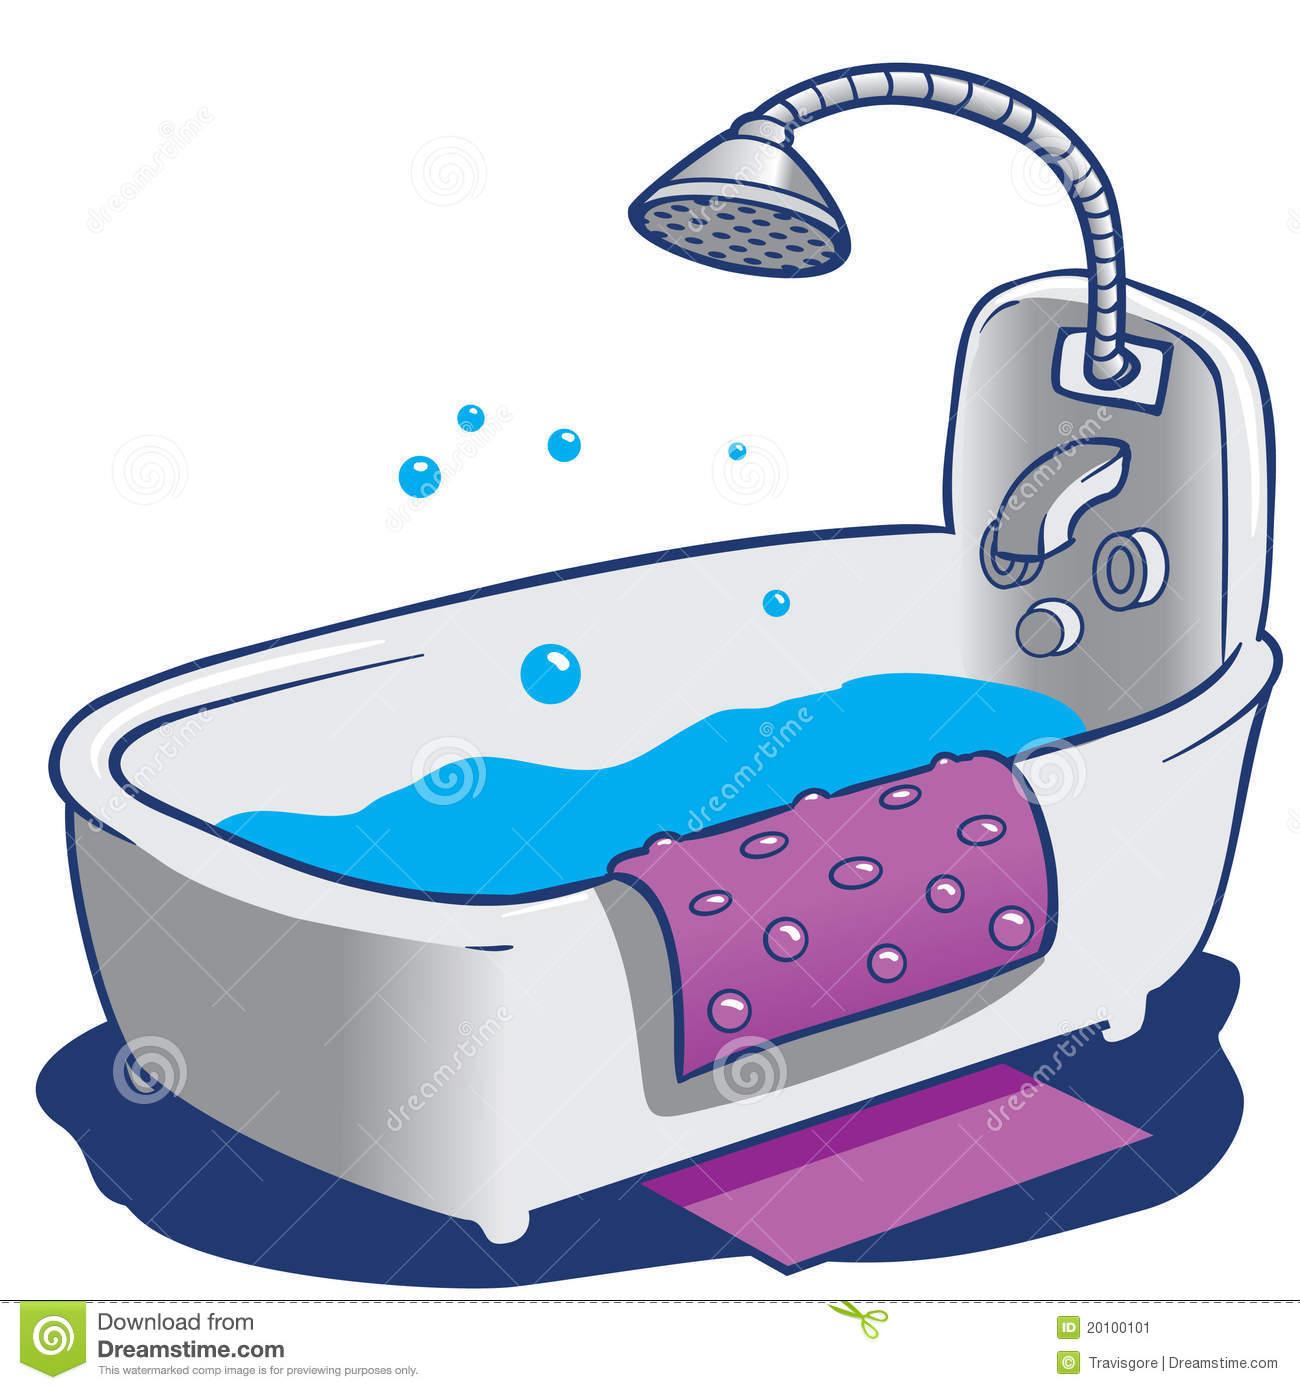 Bath Shower Clipart Bath Tub And Shower-Bath Shower Clipart Bath Tub And Shower-10